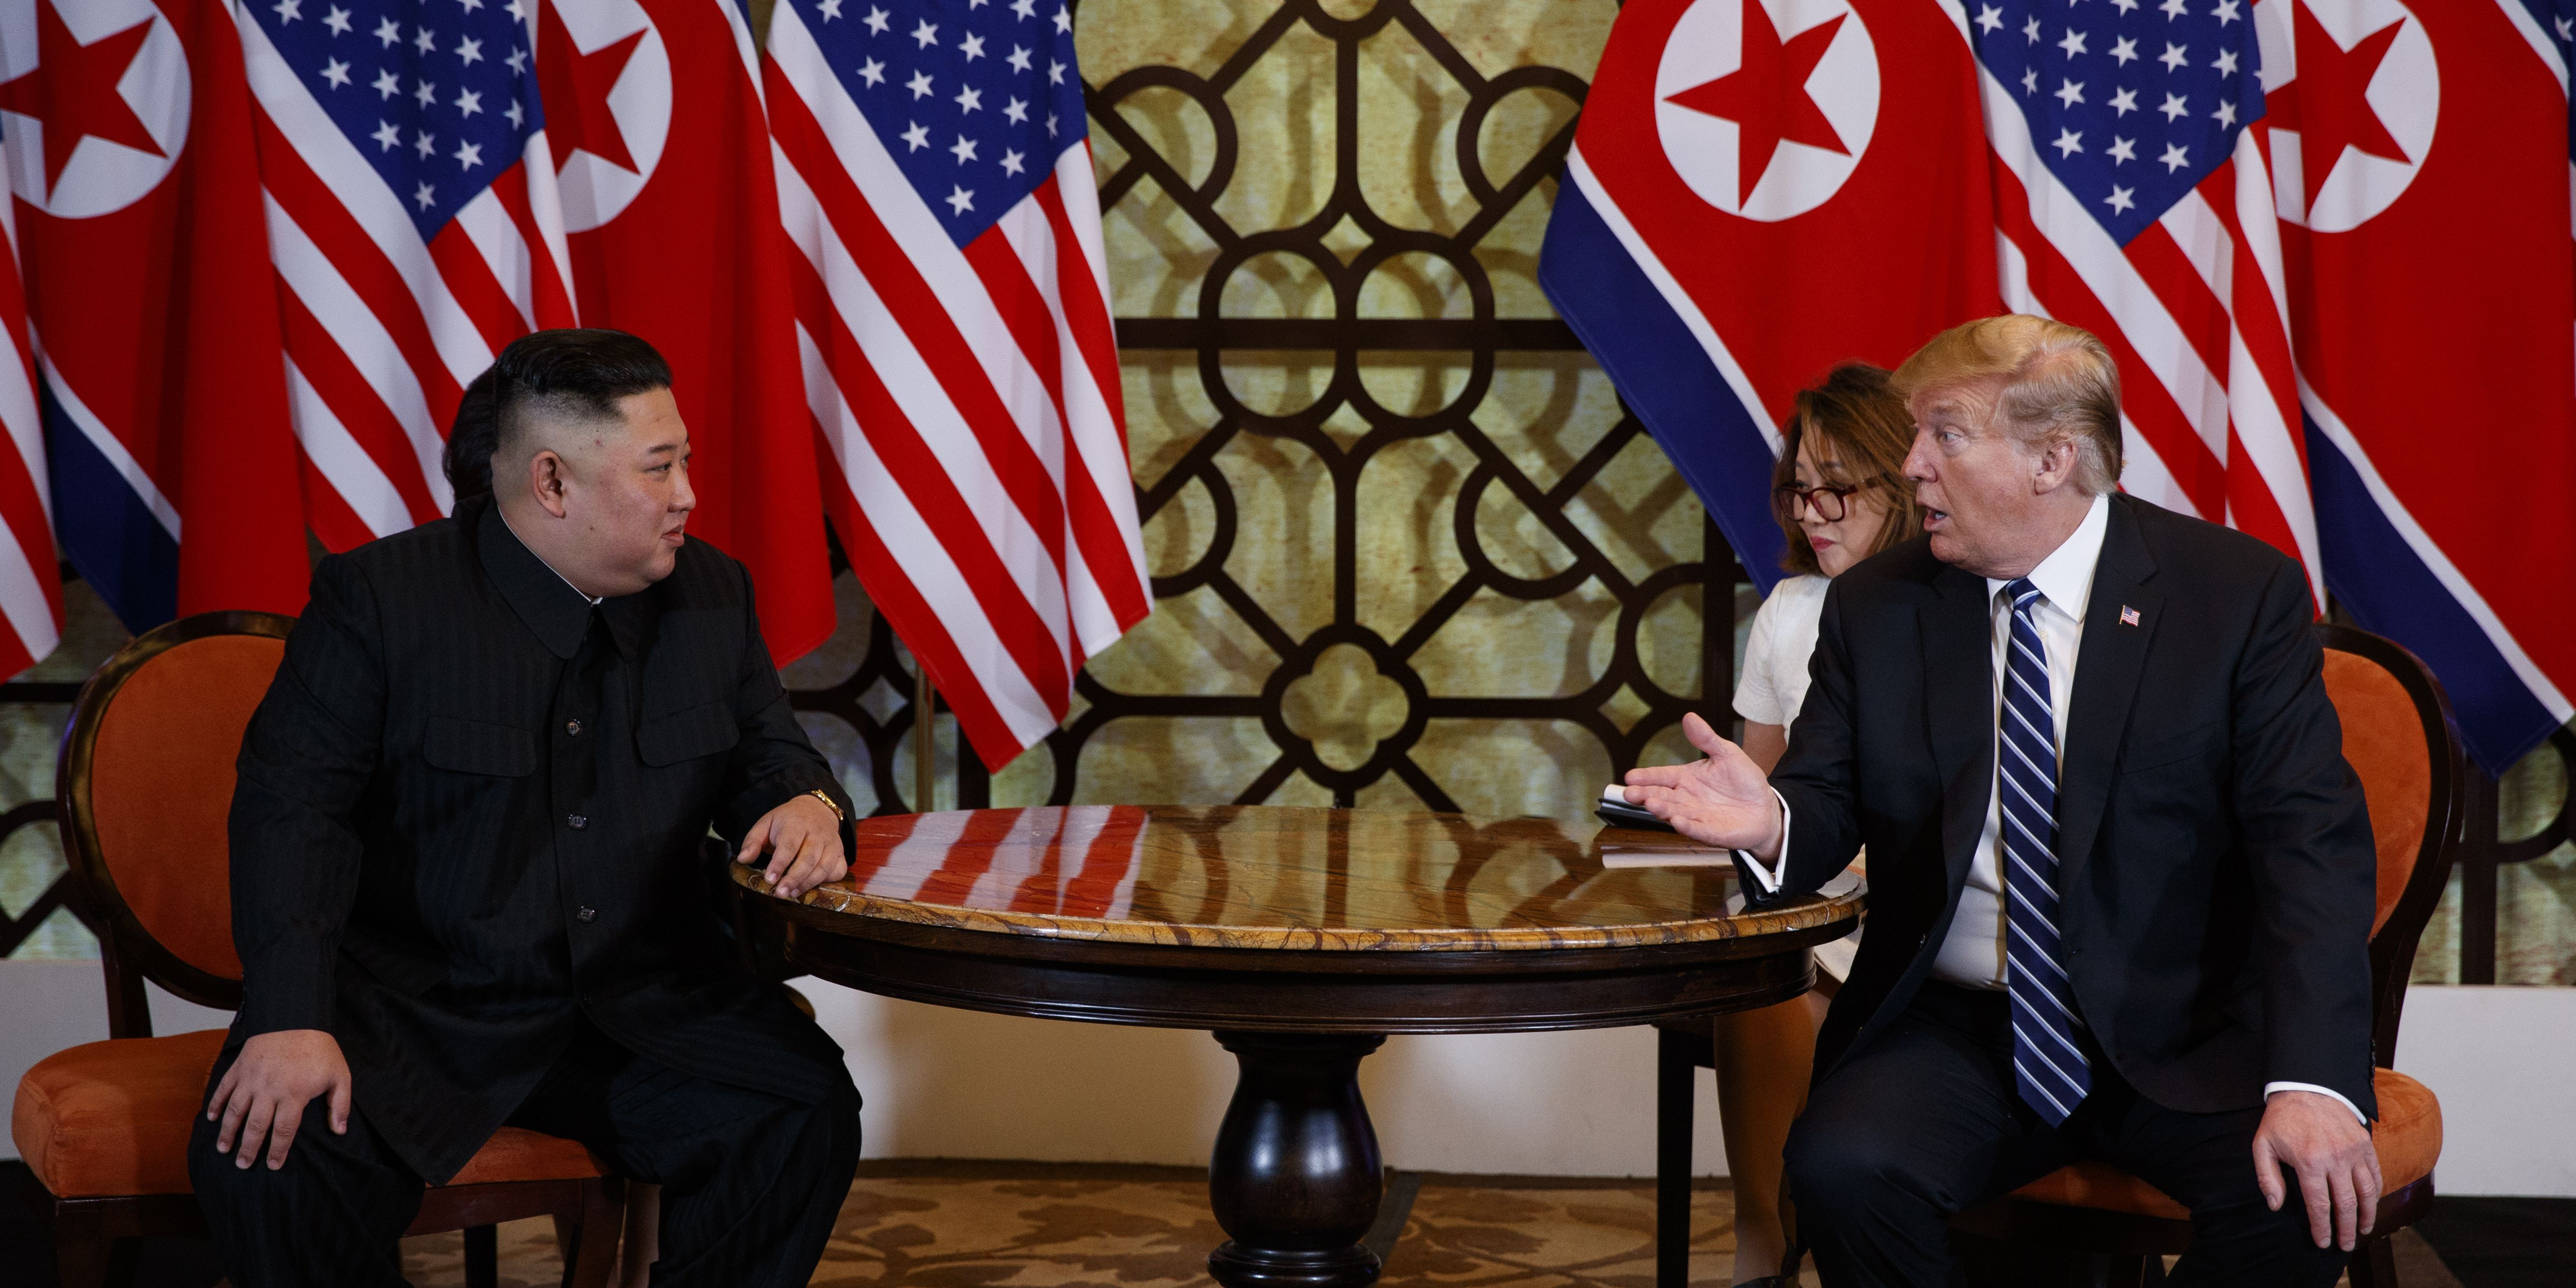 Trump claims Cohen hearing may have hurt North Korea results